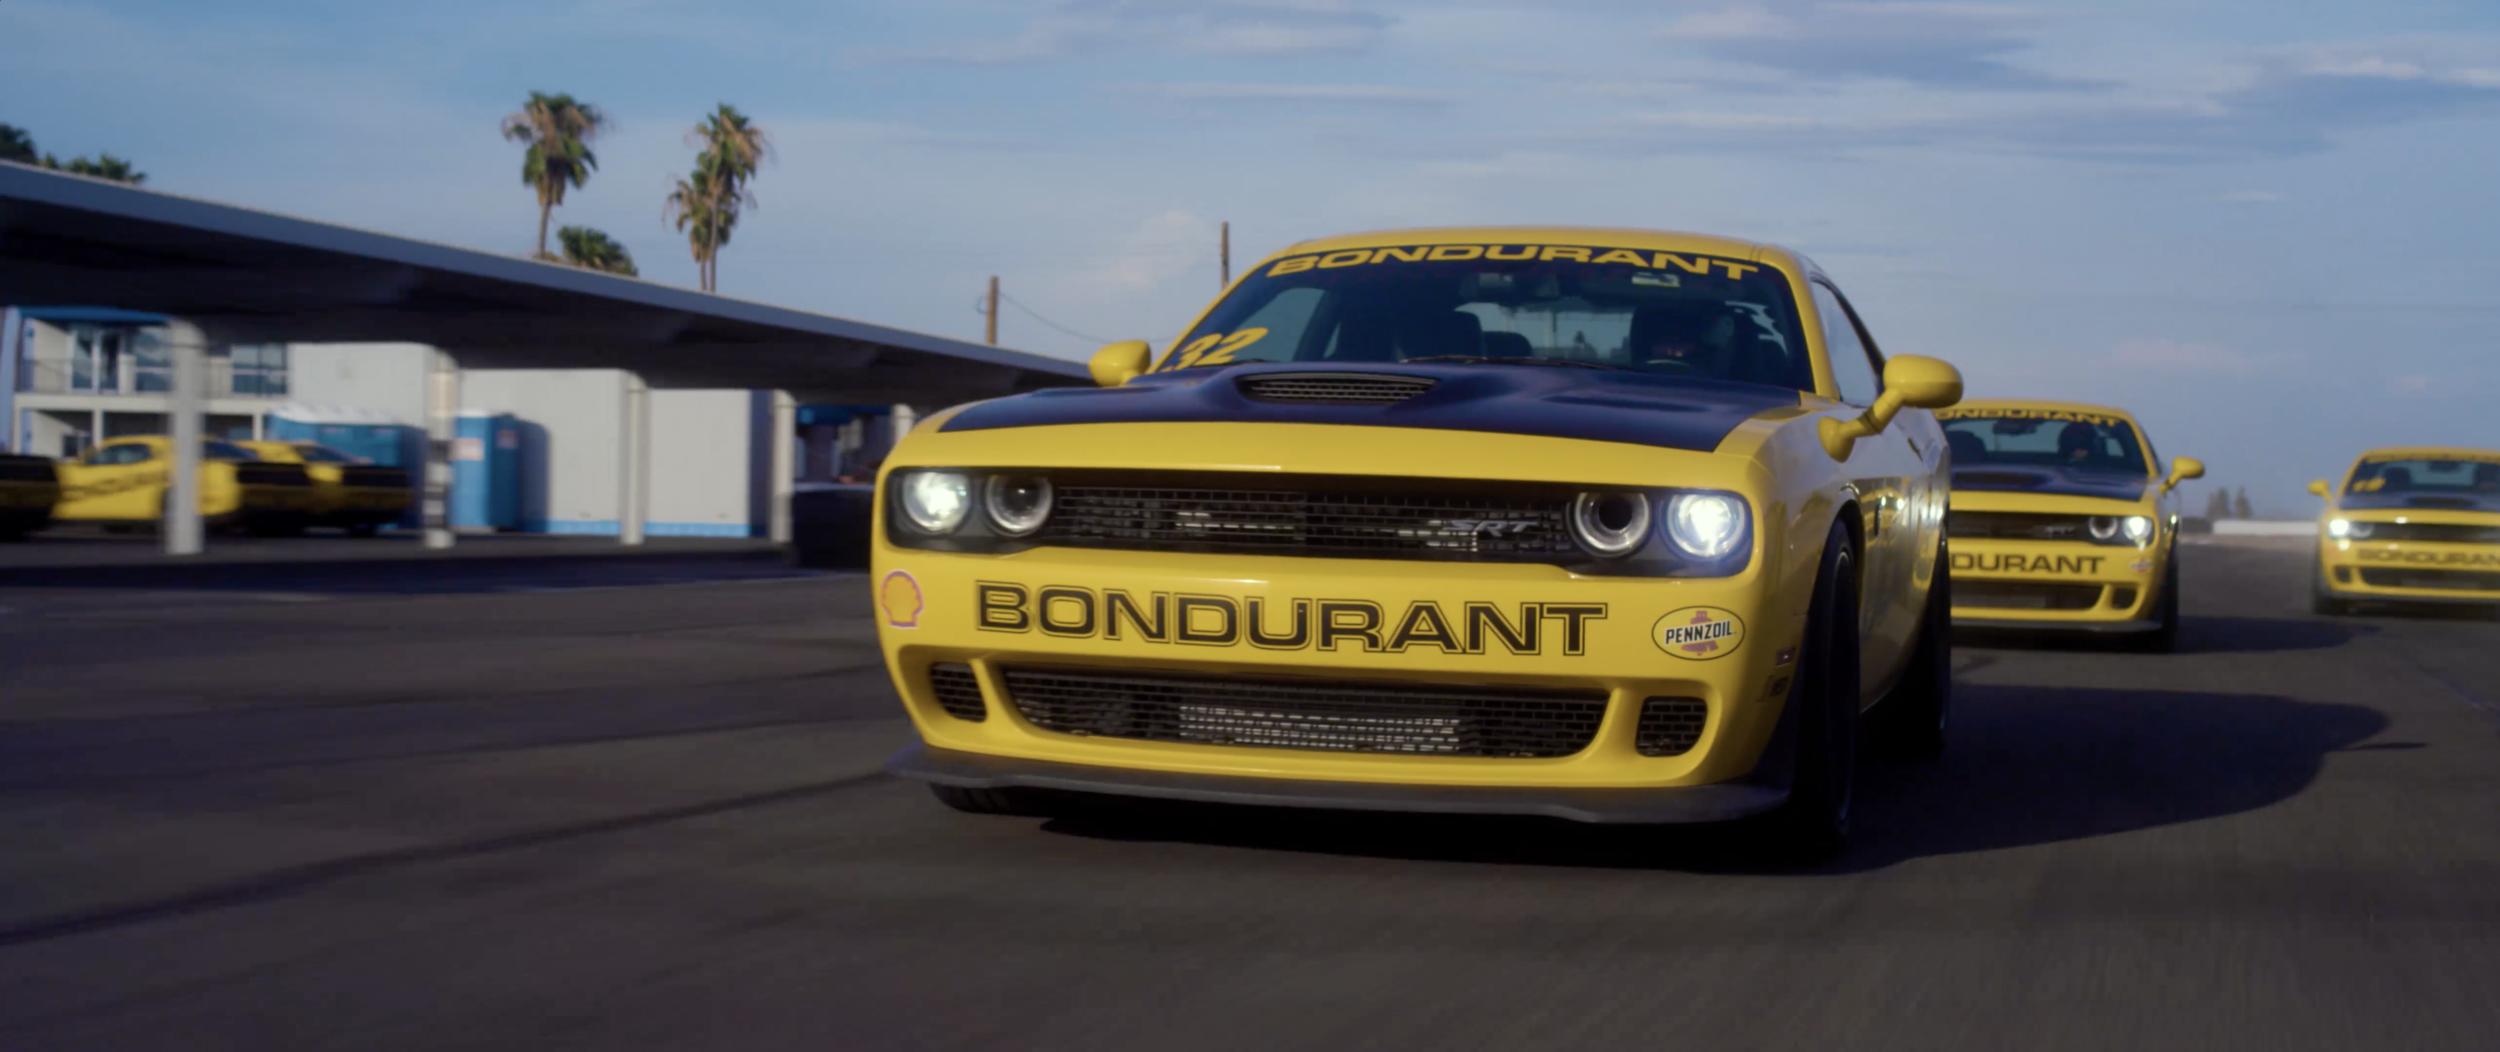 Bondurant: Drive Like A Pro